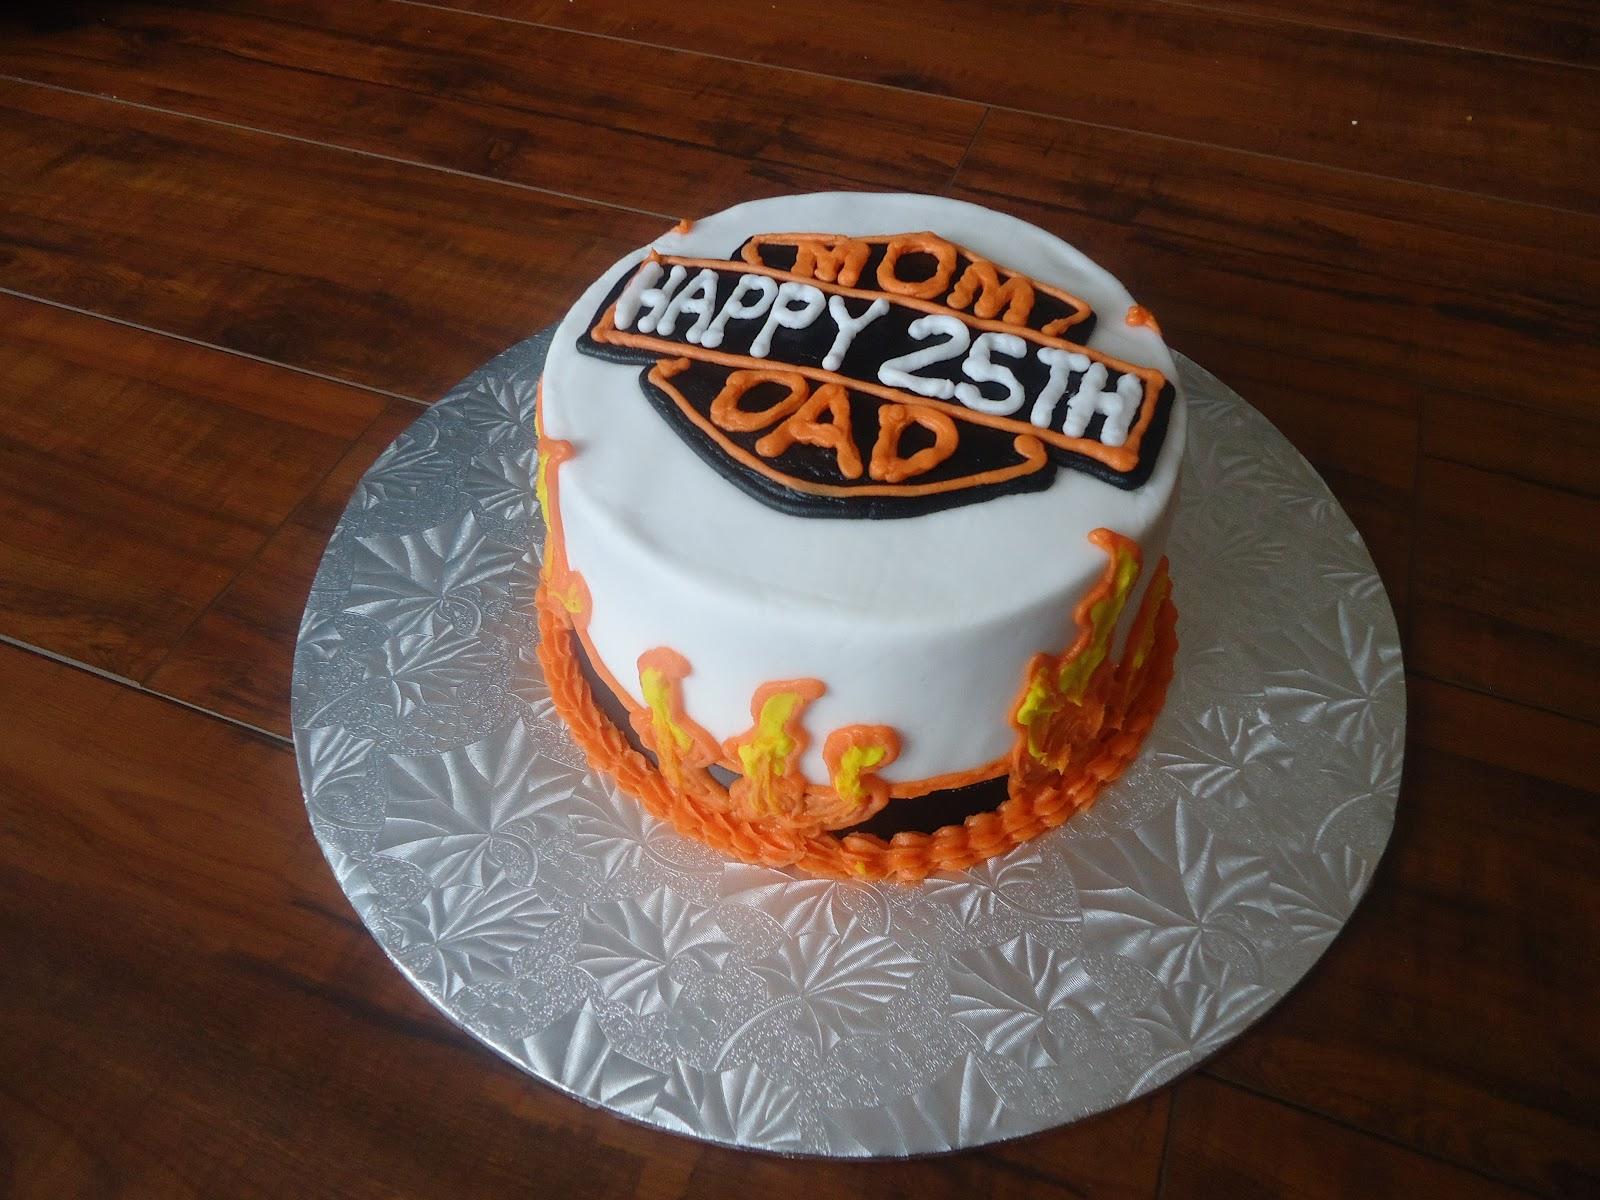 The Best Harley Davidson Cakes Ideas 71083 Harley Davidson